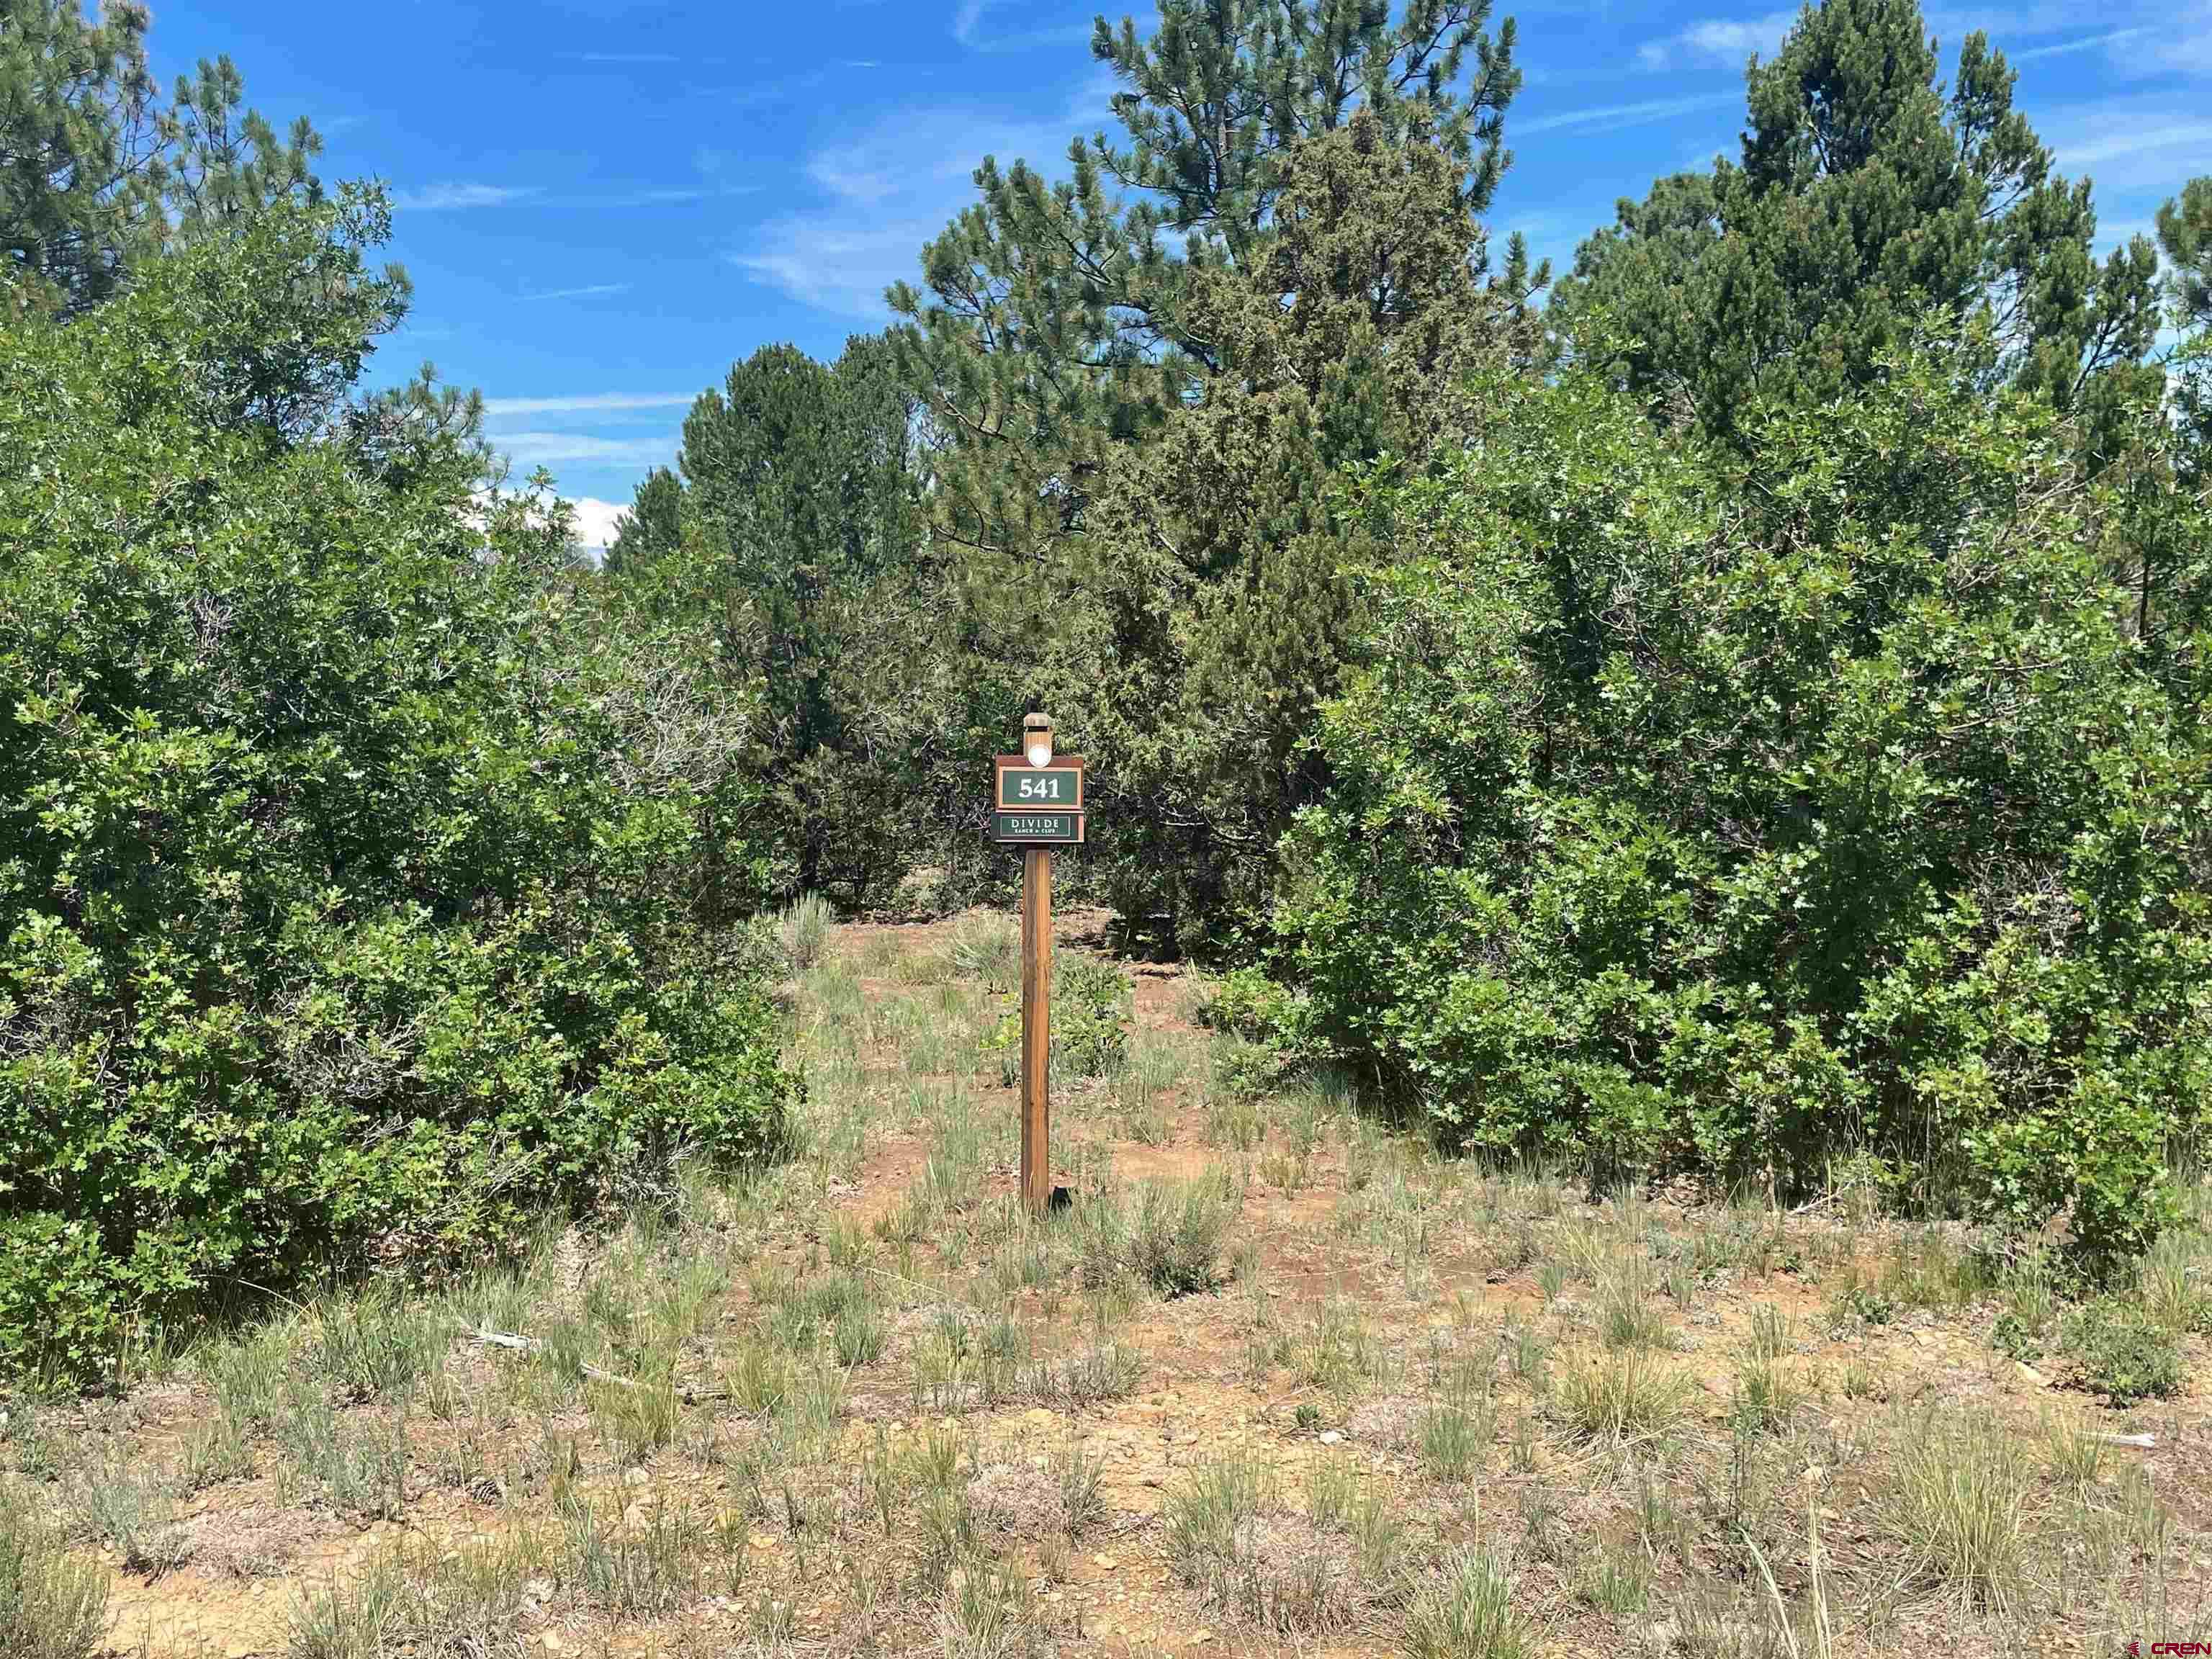 Tbd (lot 541) N Badger Trail Property Photo